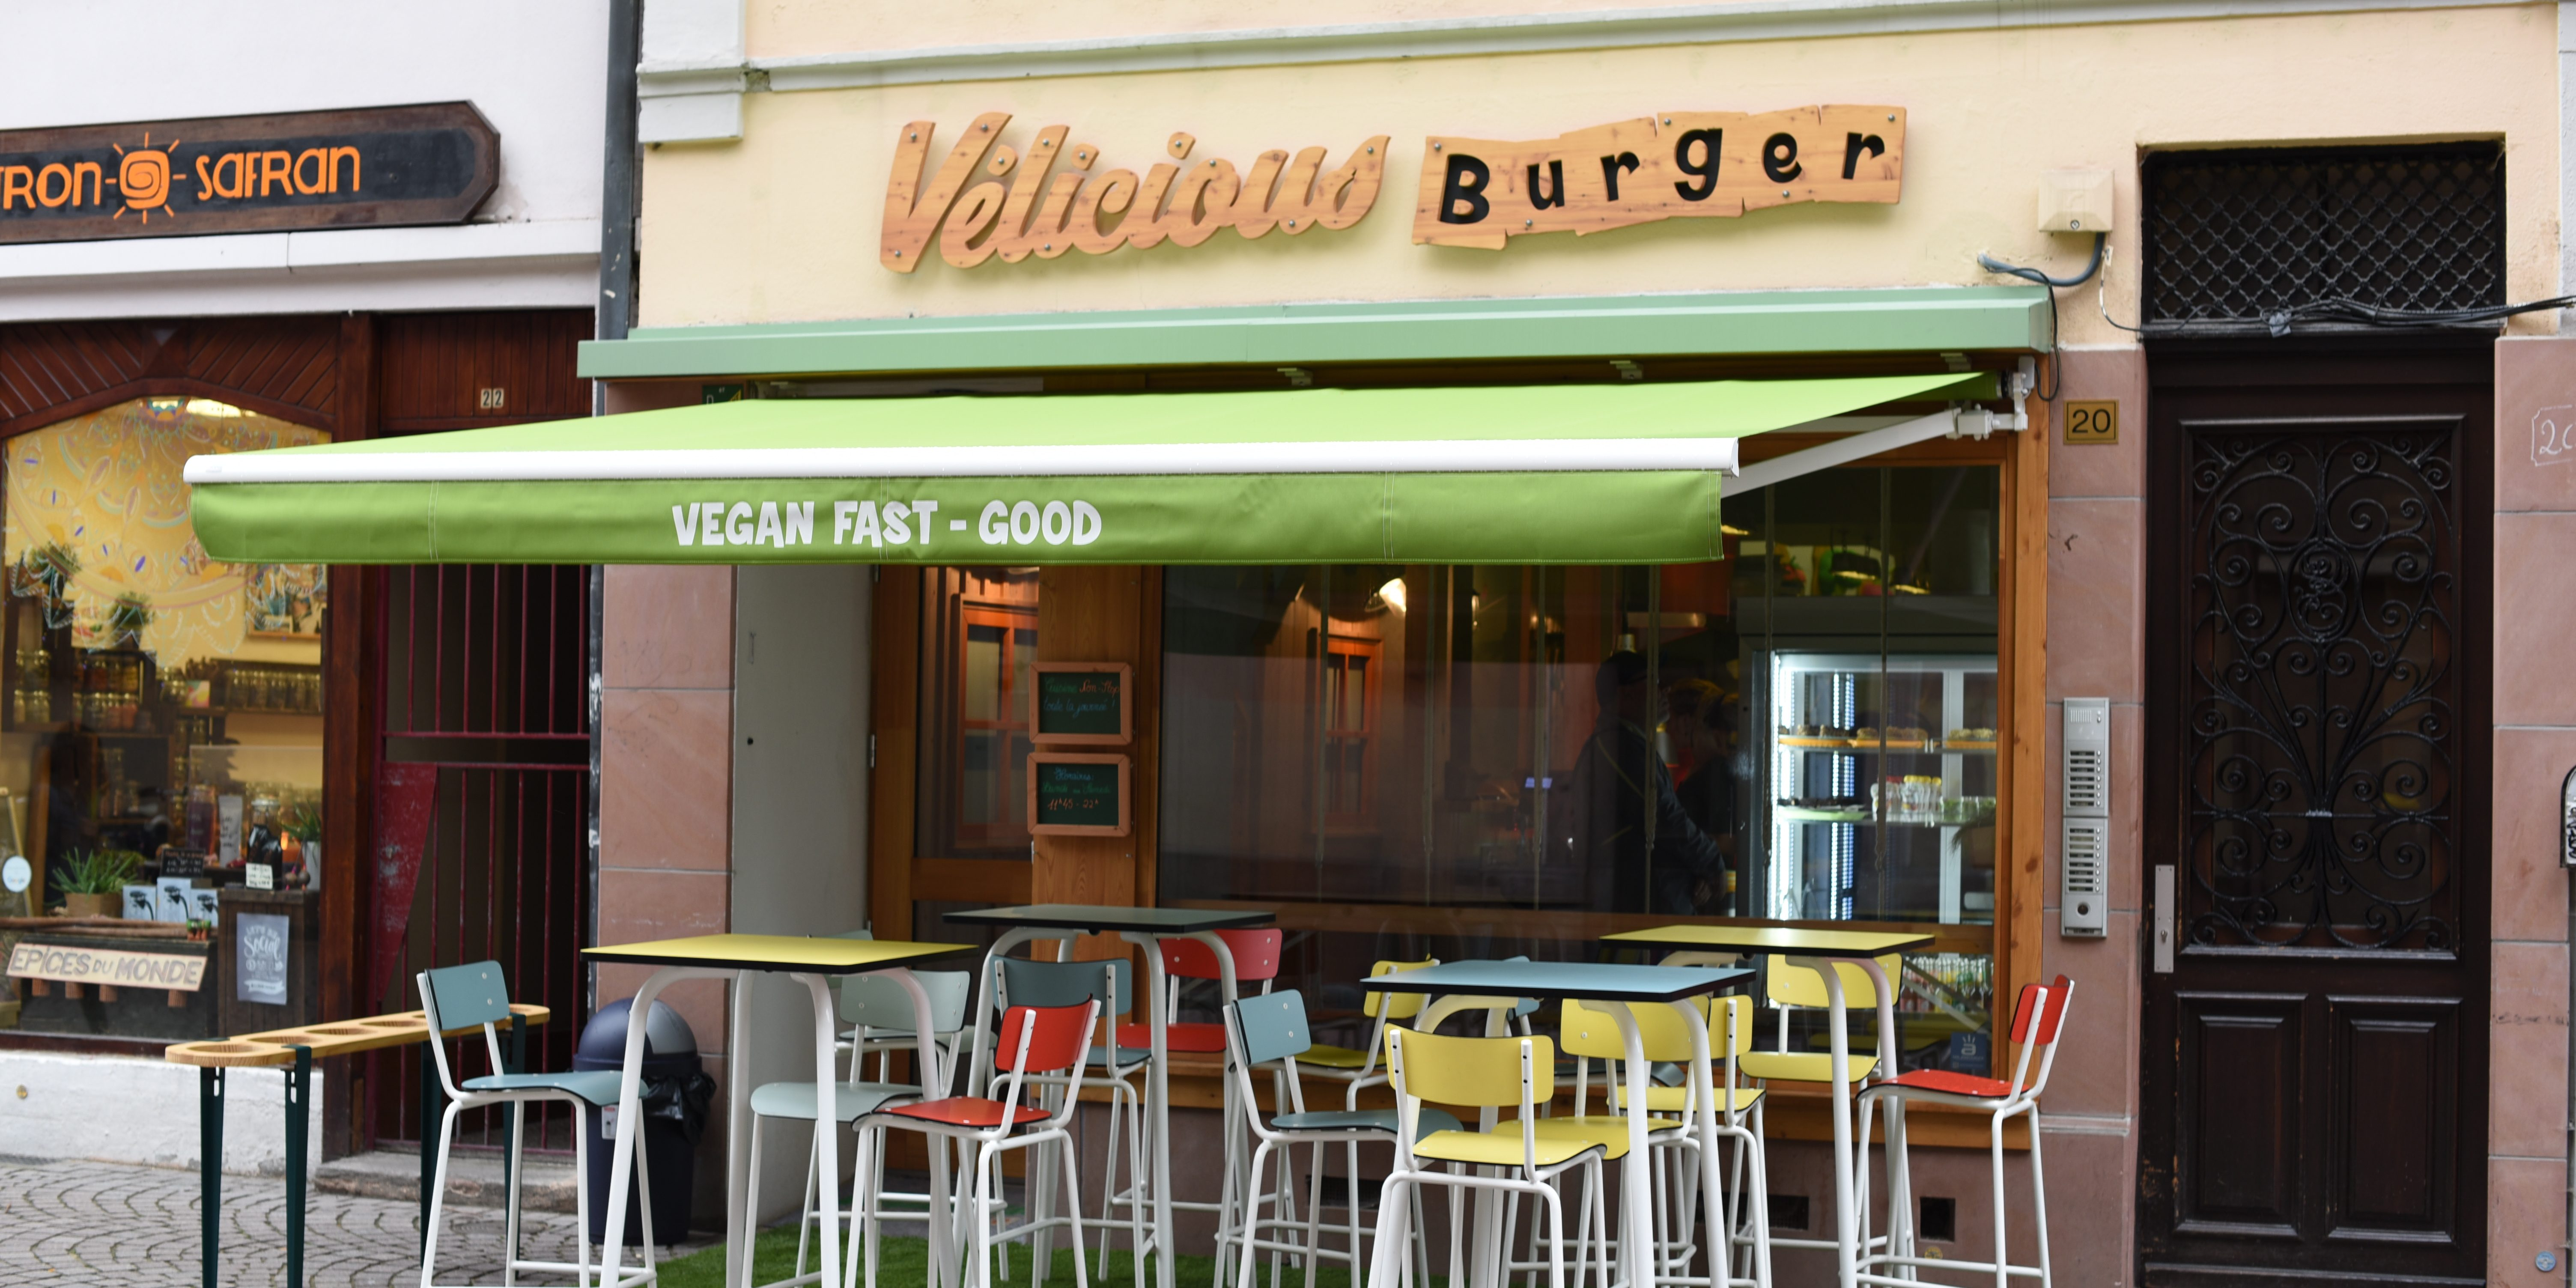 velicious burger le fast food vegan en plein coeur de strasbourg. Black Bedroom Furniture Sets. Home Design Ideas